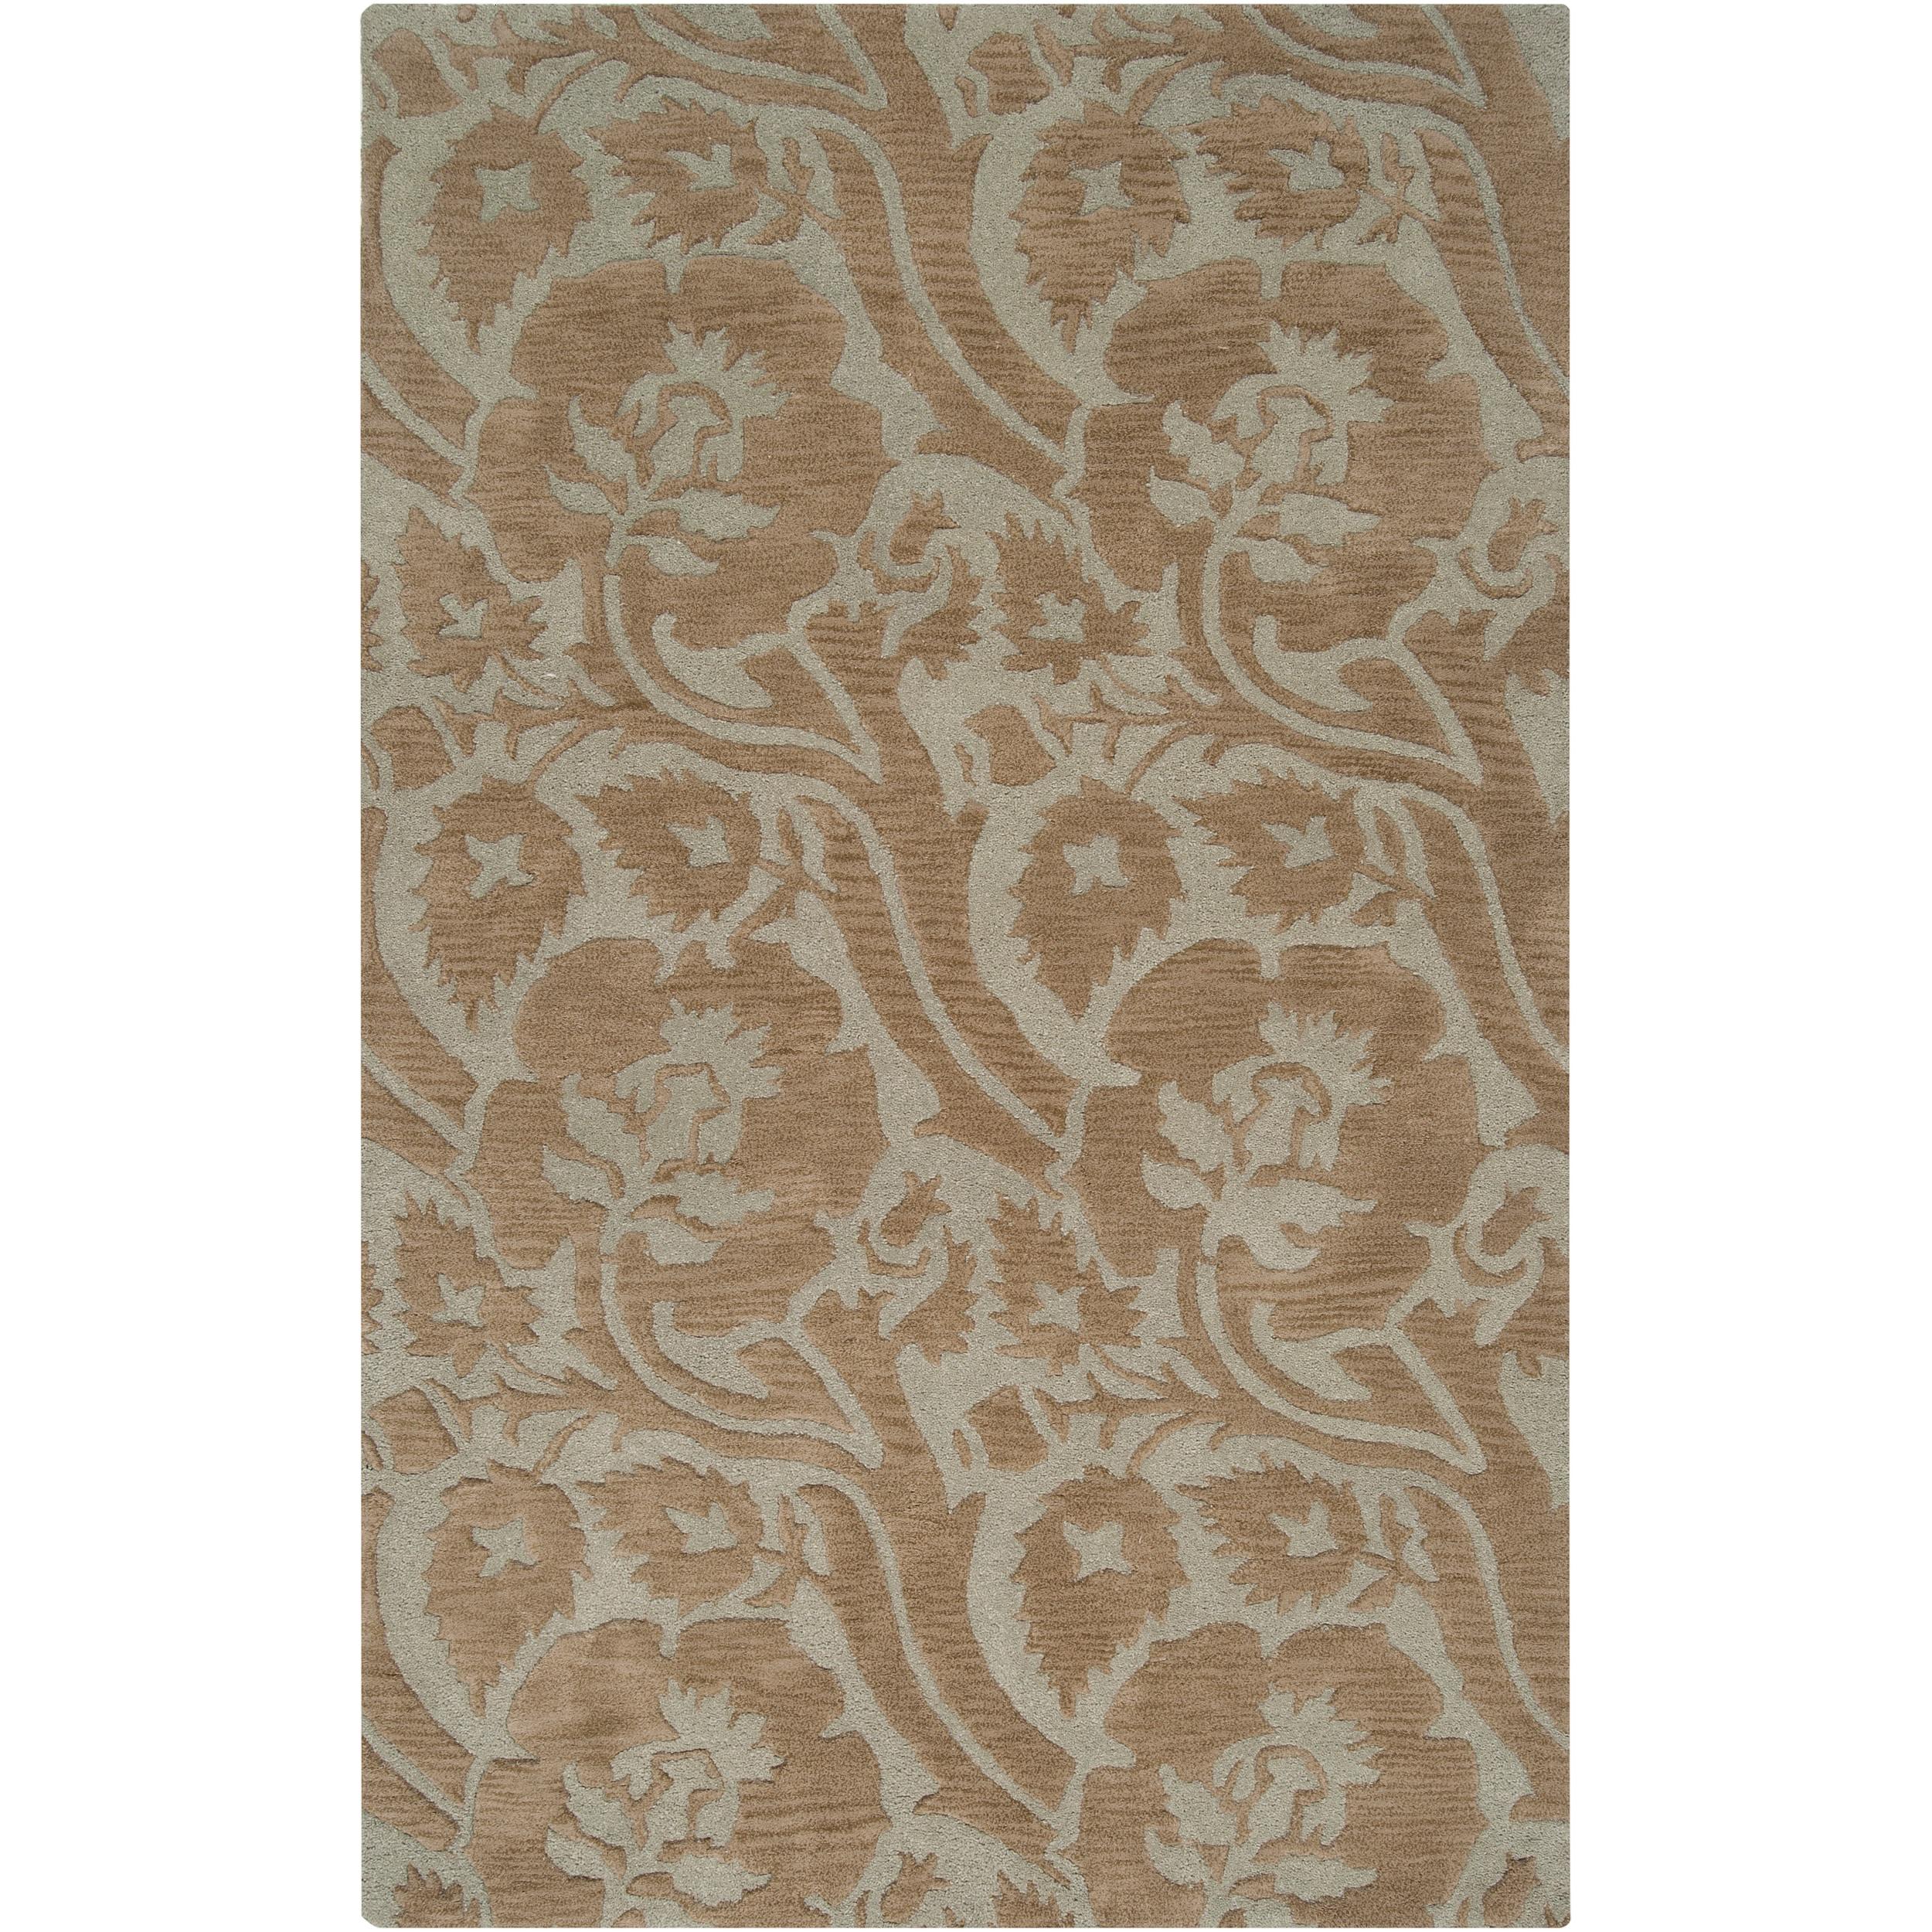 Transitional Hand-Tufted Gray Garavogue New Zealand Wool Rug (9' x 13')